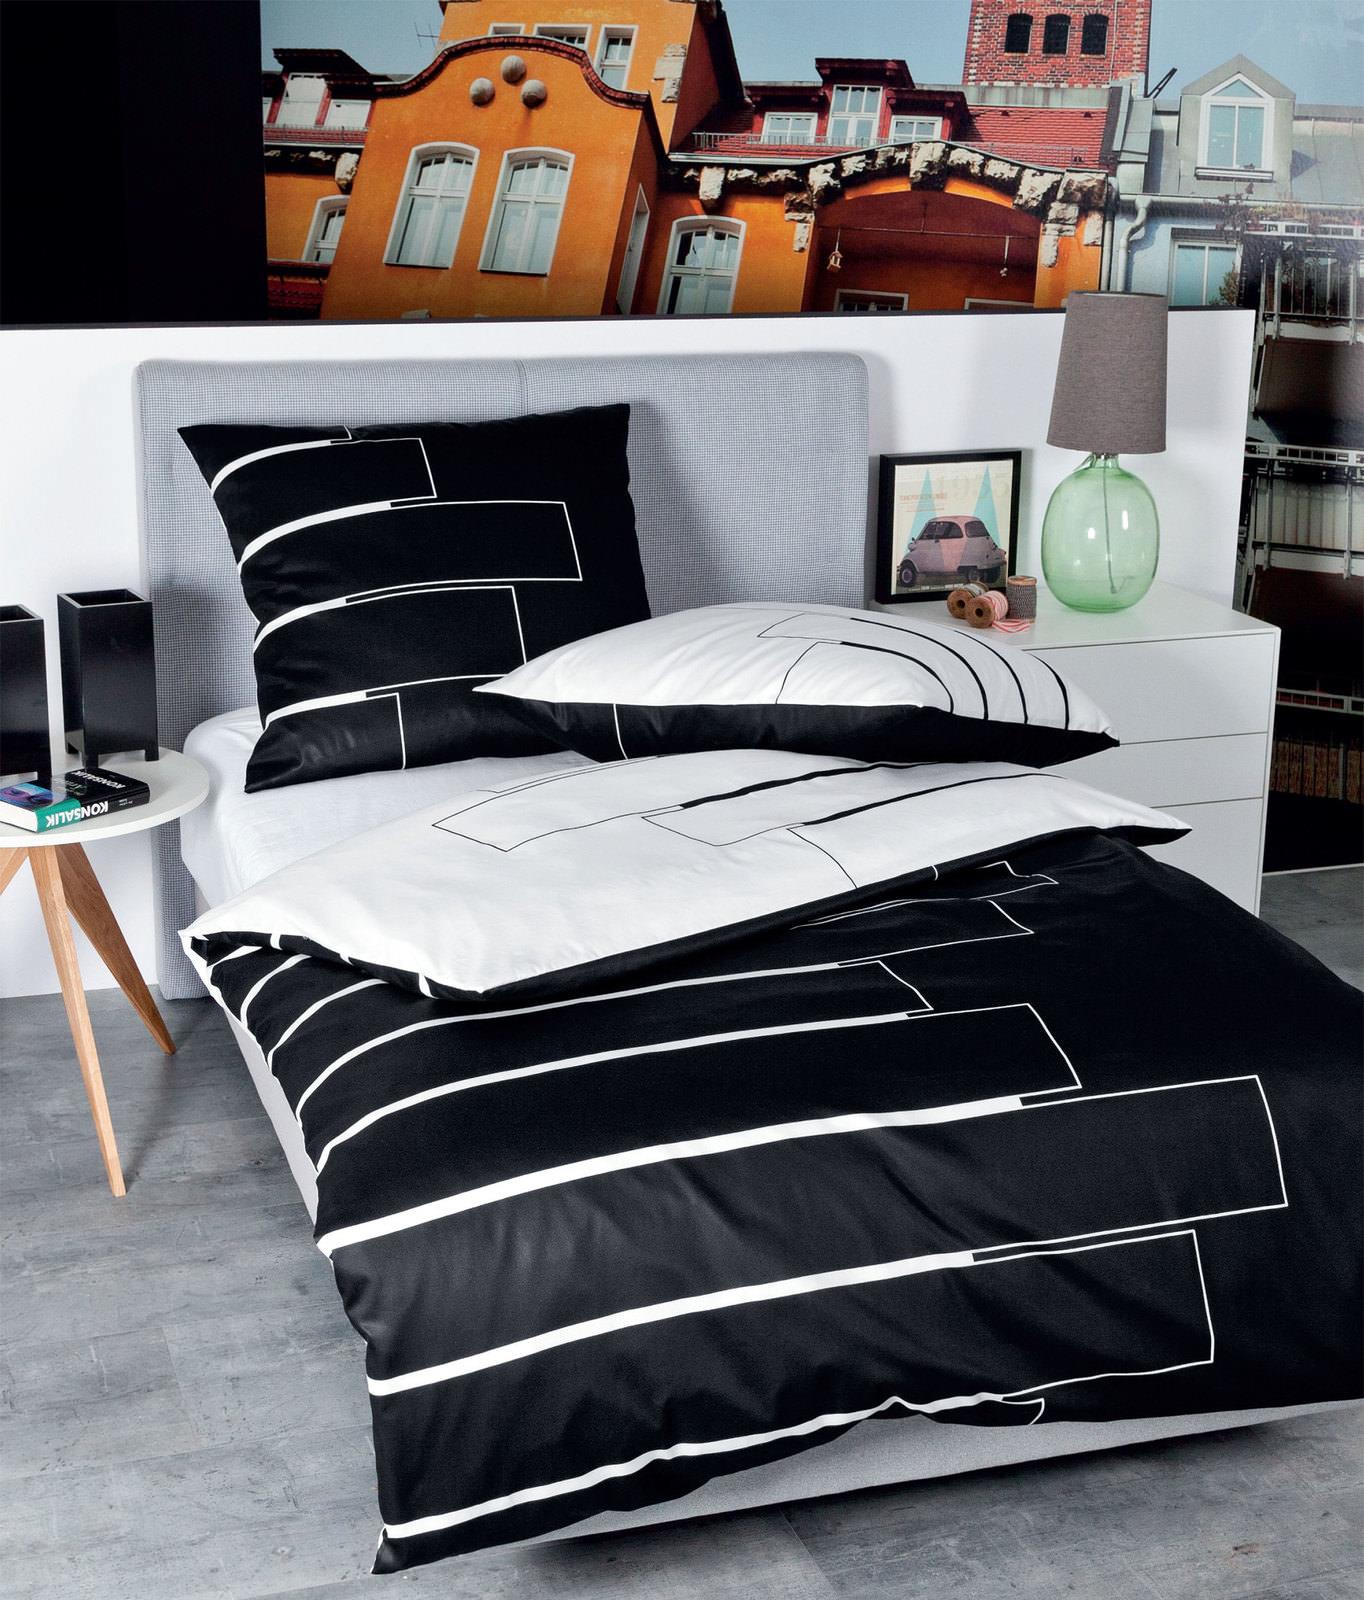 janine mako satin bettw sche online entdecken knuffmann. Black Bedroom Furniture Sets. Home Design Ideas